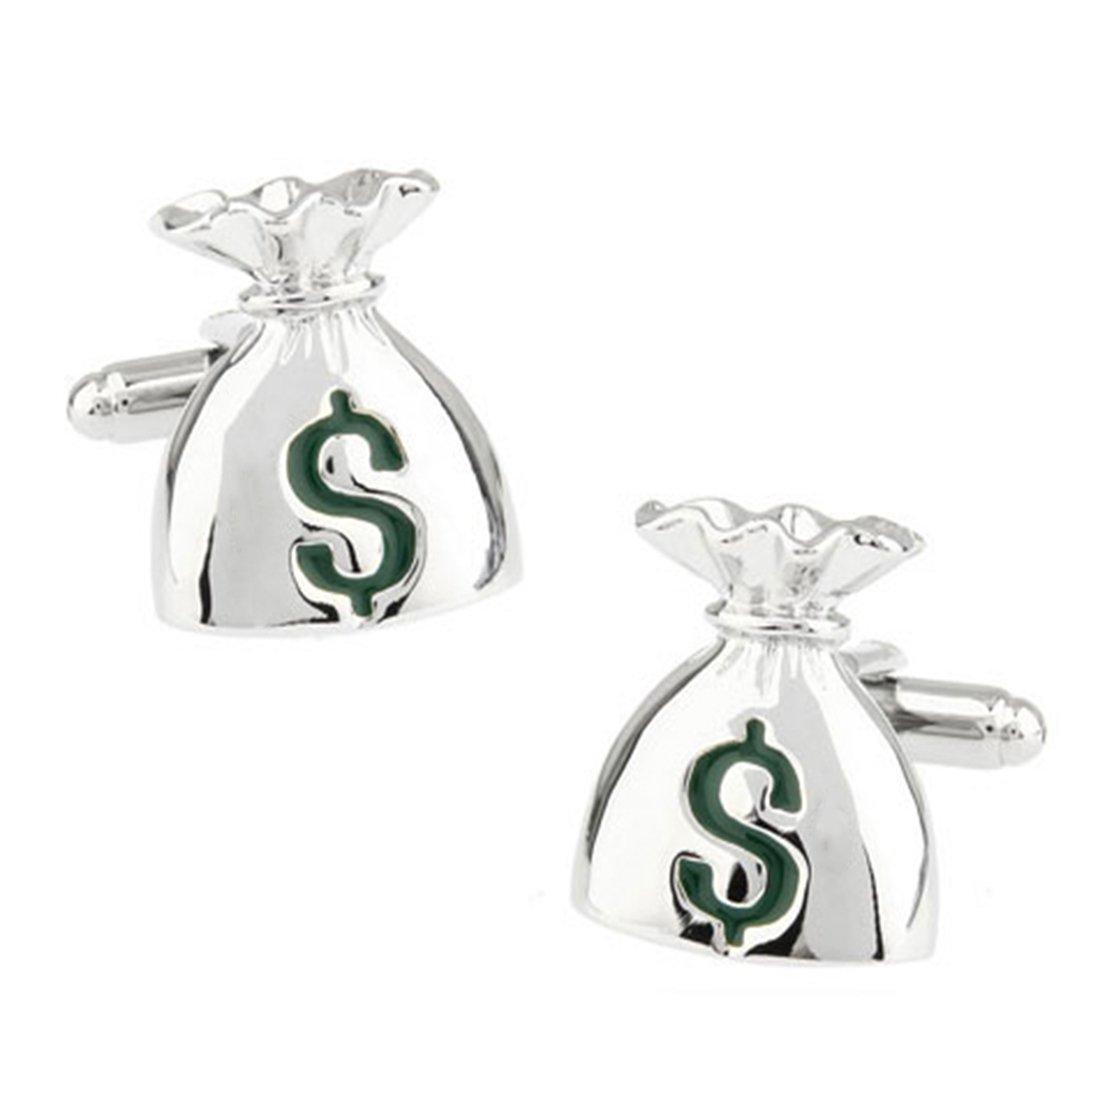 The Jewelbox Money Bag Dollar Silver Rhodium Brass Cufflink Formal Shirt Blazer Suit Cufflinks Pair Men Gift Box